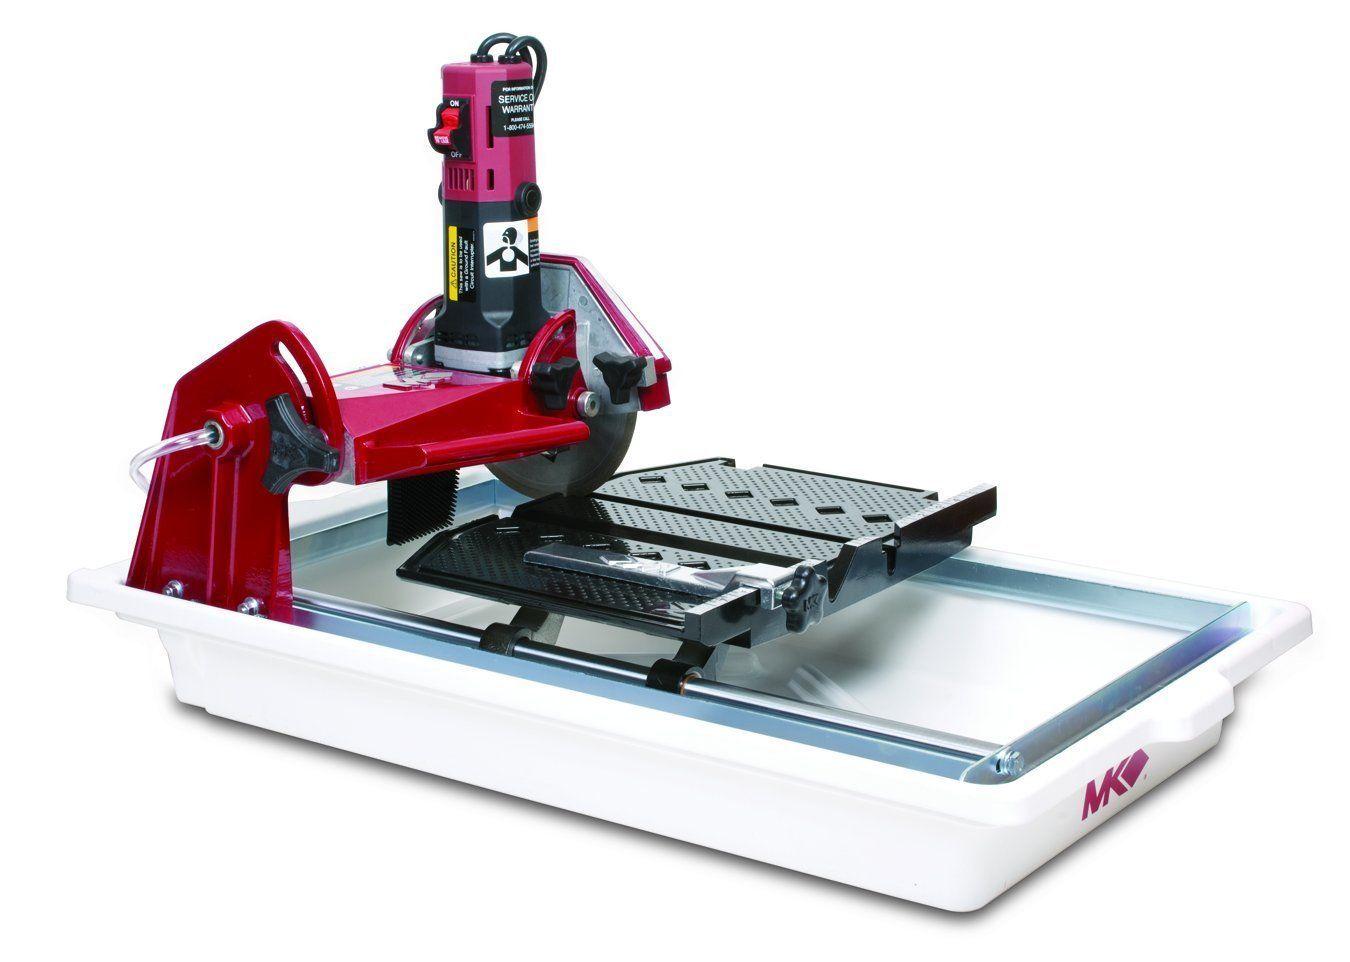 Mk Diamond Mk 370exp Wet Tile Saw In 2020 Tile Saw Tile Saws Table Saw